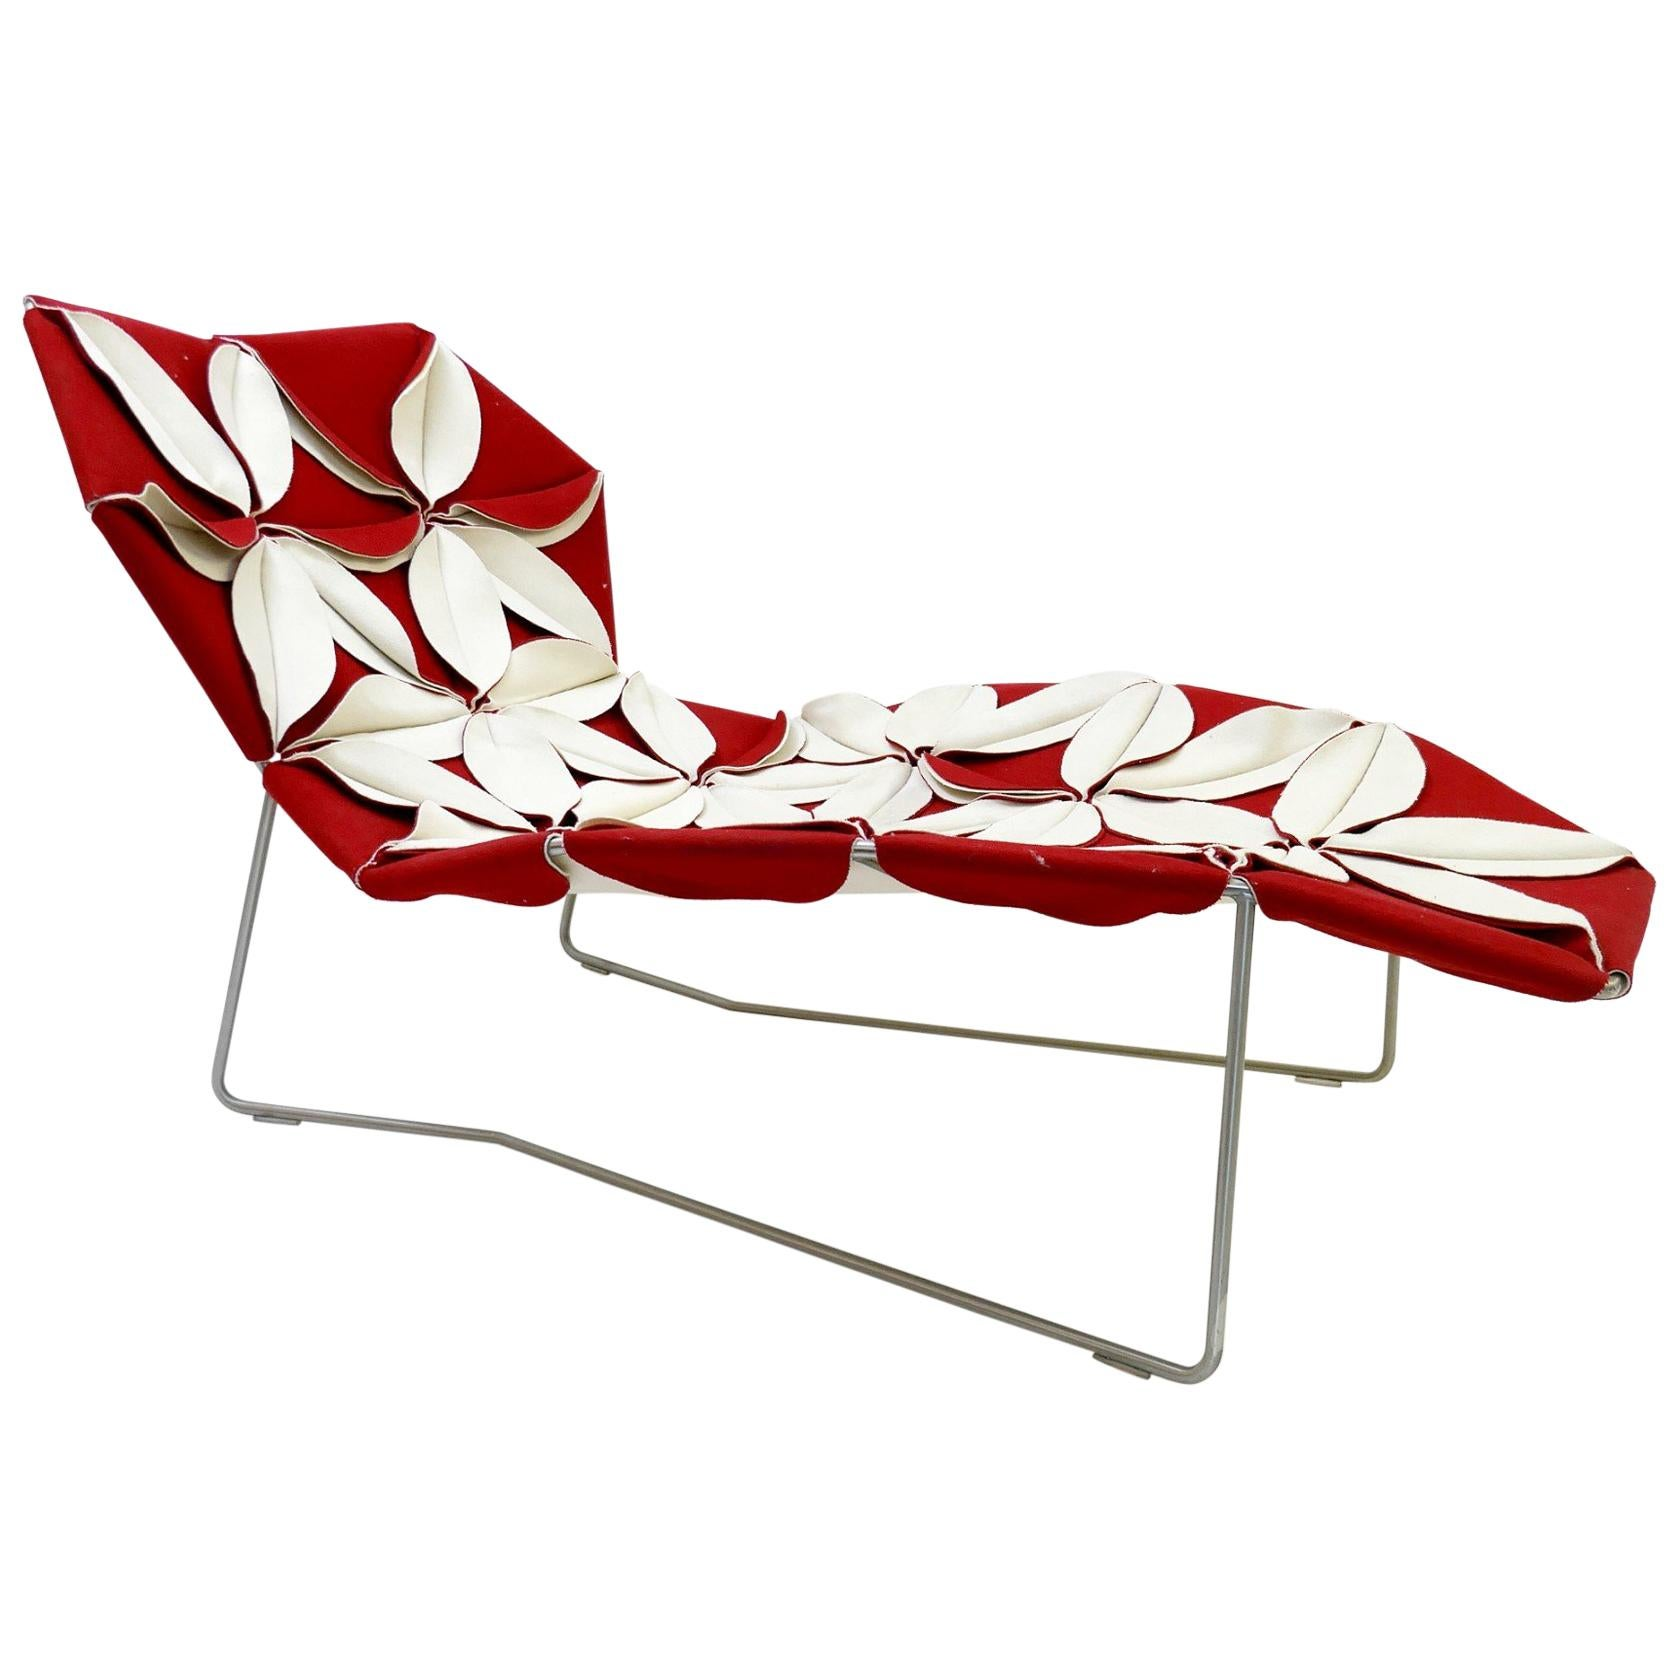 Antibodi Chair by Patricia Urquiola for Moroso, Italy, 2006